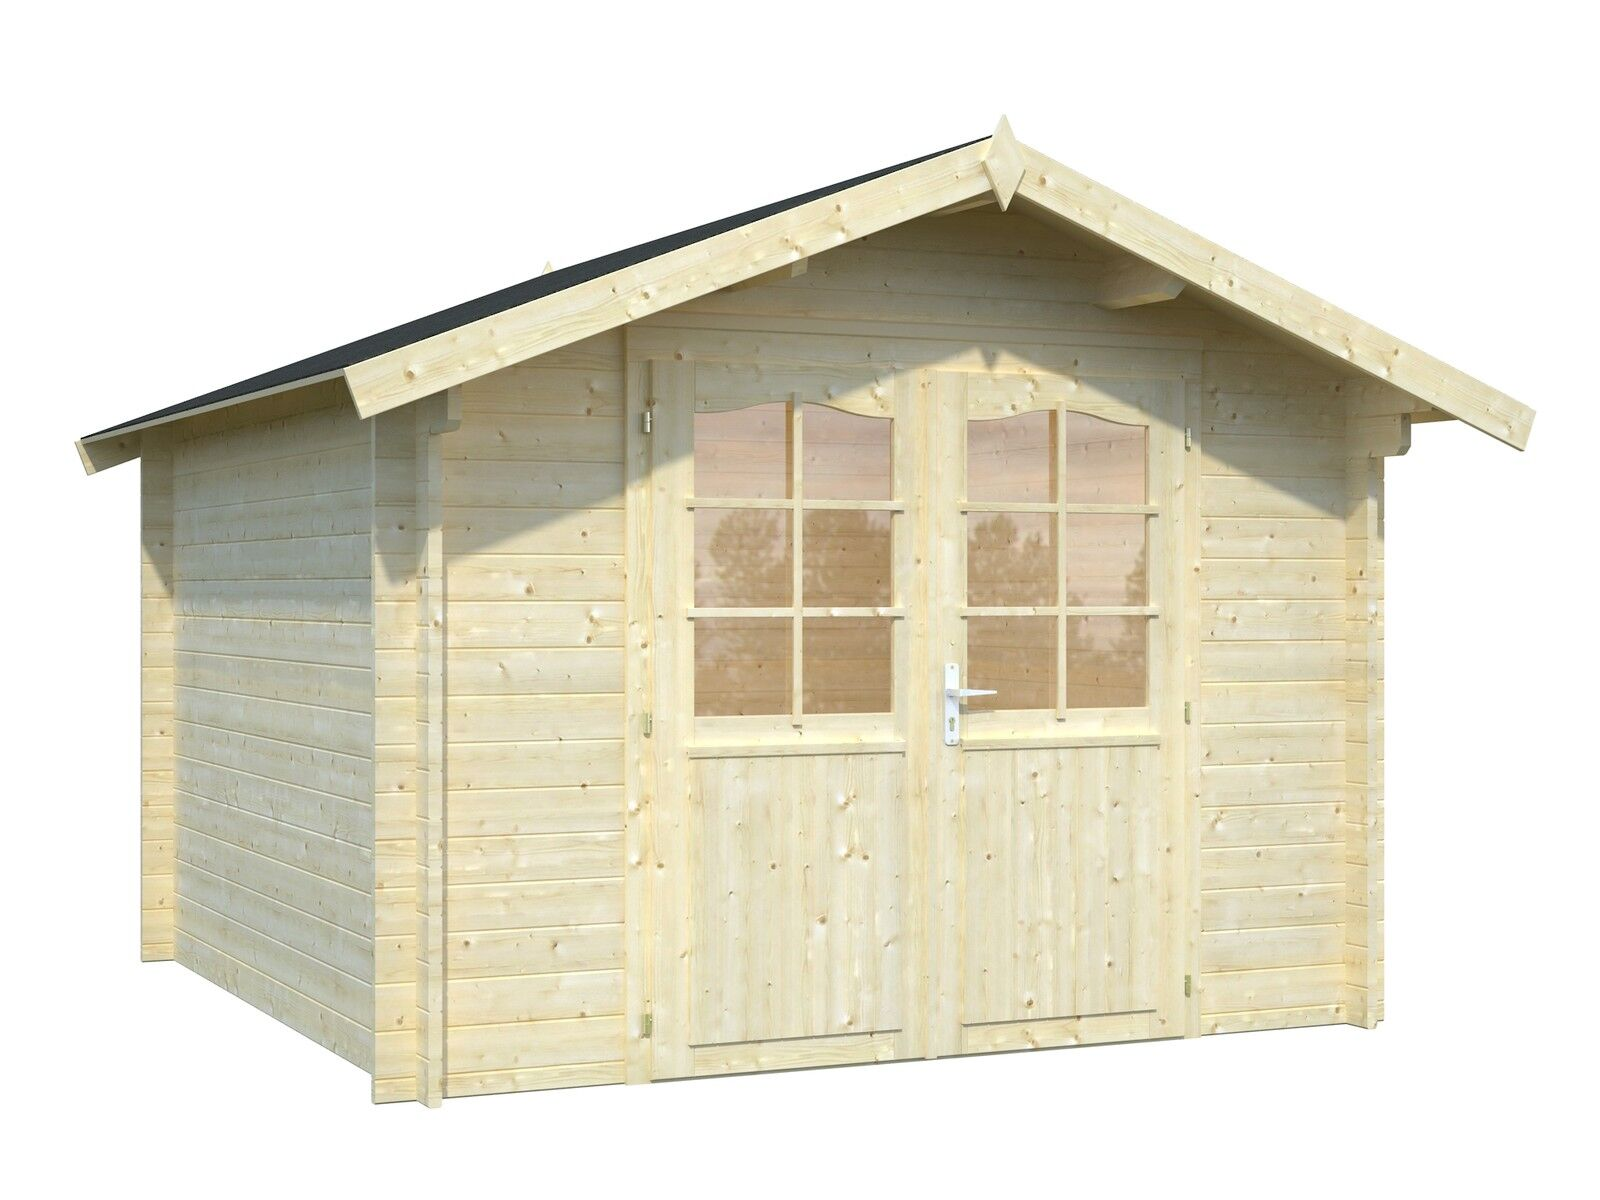 gartenhaus holz 300 x 250 my blog. Black Bedroom Furniture Sets. Home Design Ideas